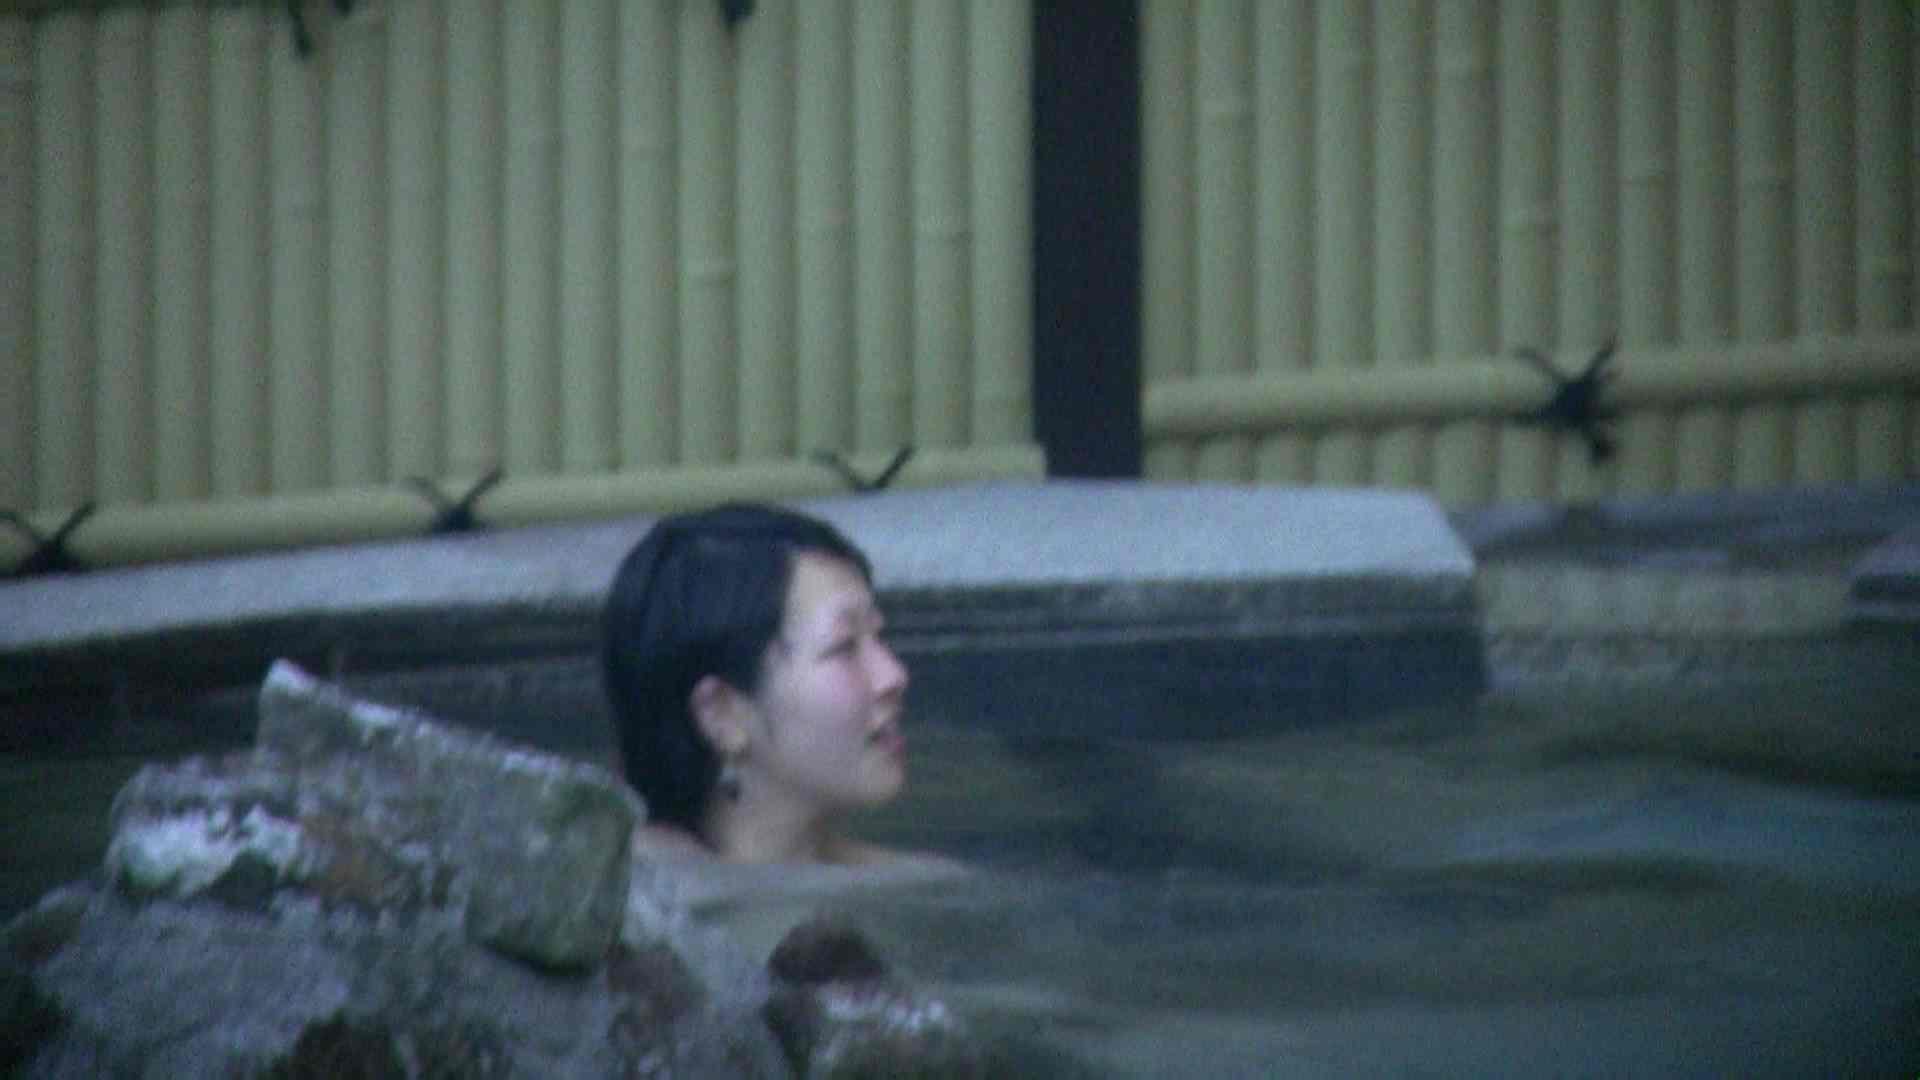 Aquaな露天風呂Vol.05【VIP】 露天風呂編 | 盗撮シリーズ  112PIX 7